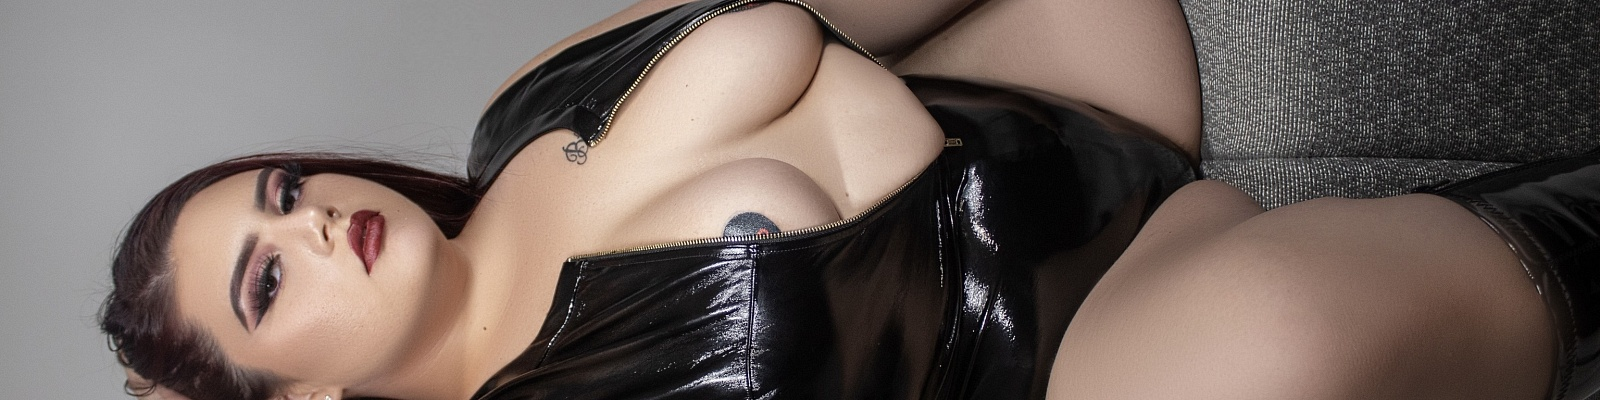 Roxy Rivers's Cover Photo